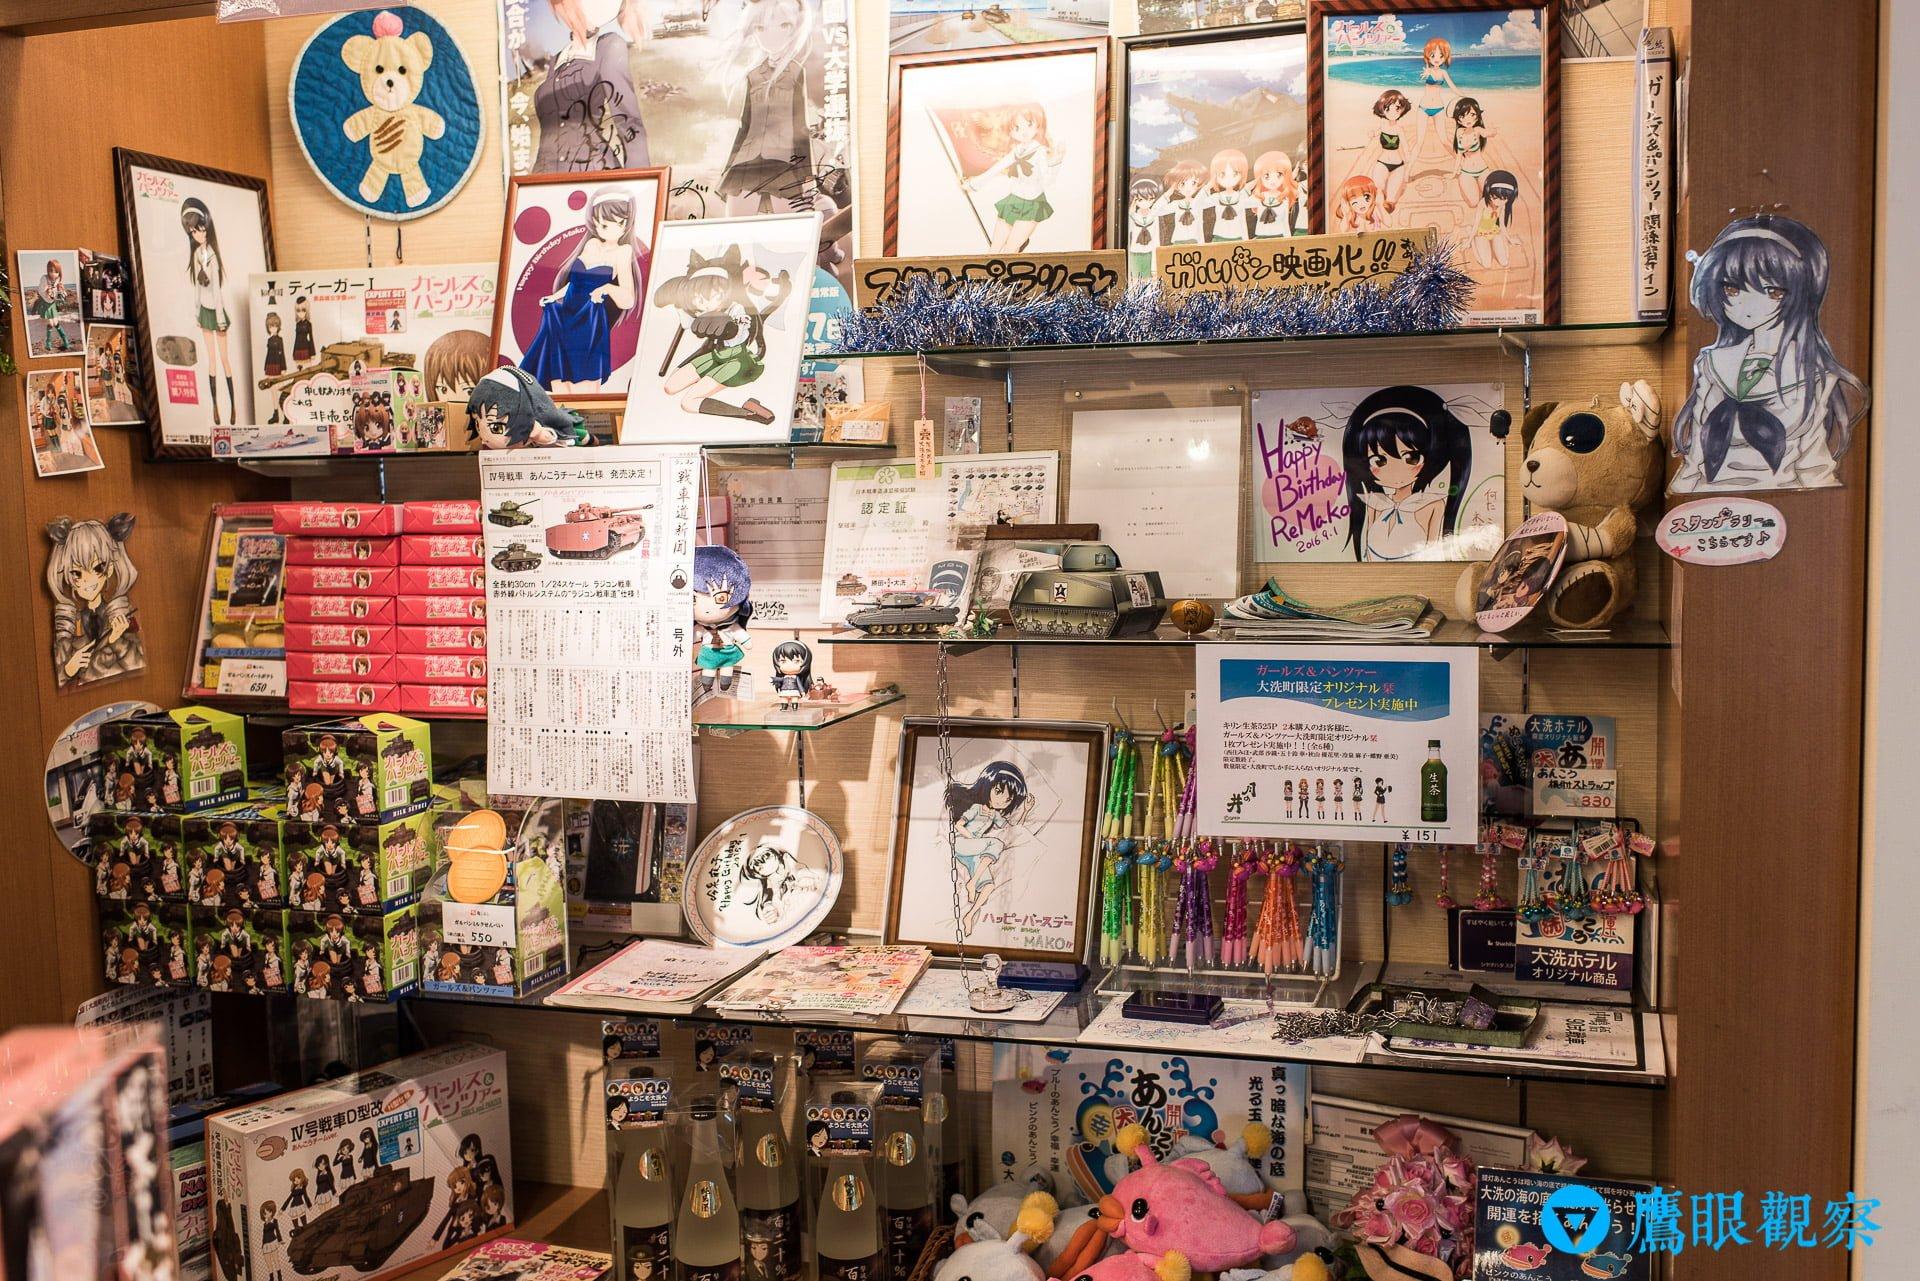 Travel Oarai Hotel in Ibaraki Prefecture Japan 98 日本茨城縣/東茨城/大洗飯店(大洗ホテル)/旅館推薦與住宿旅遊心得分享